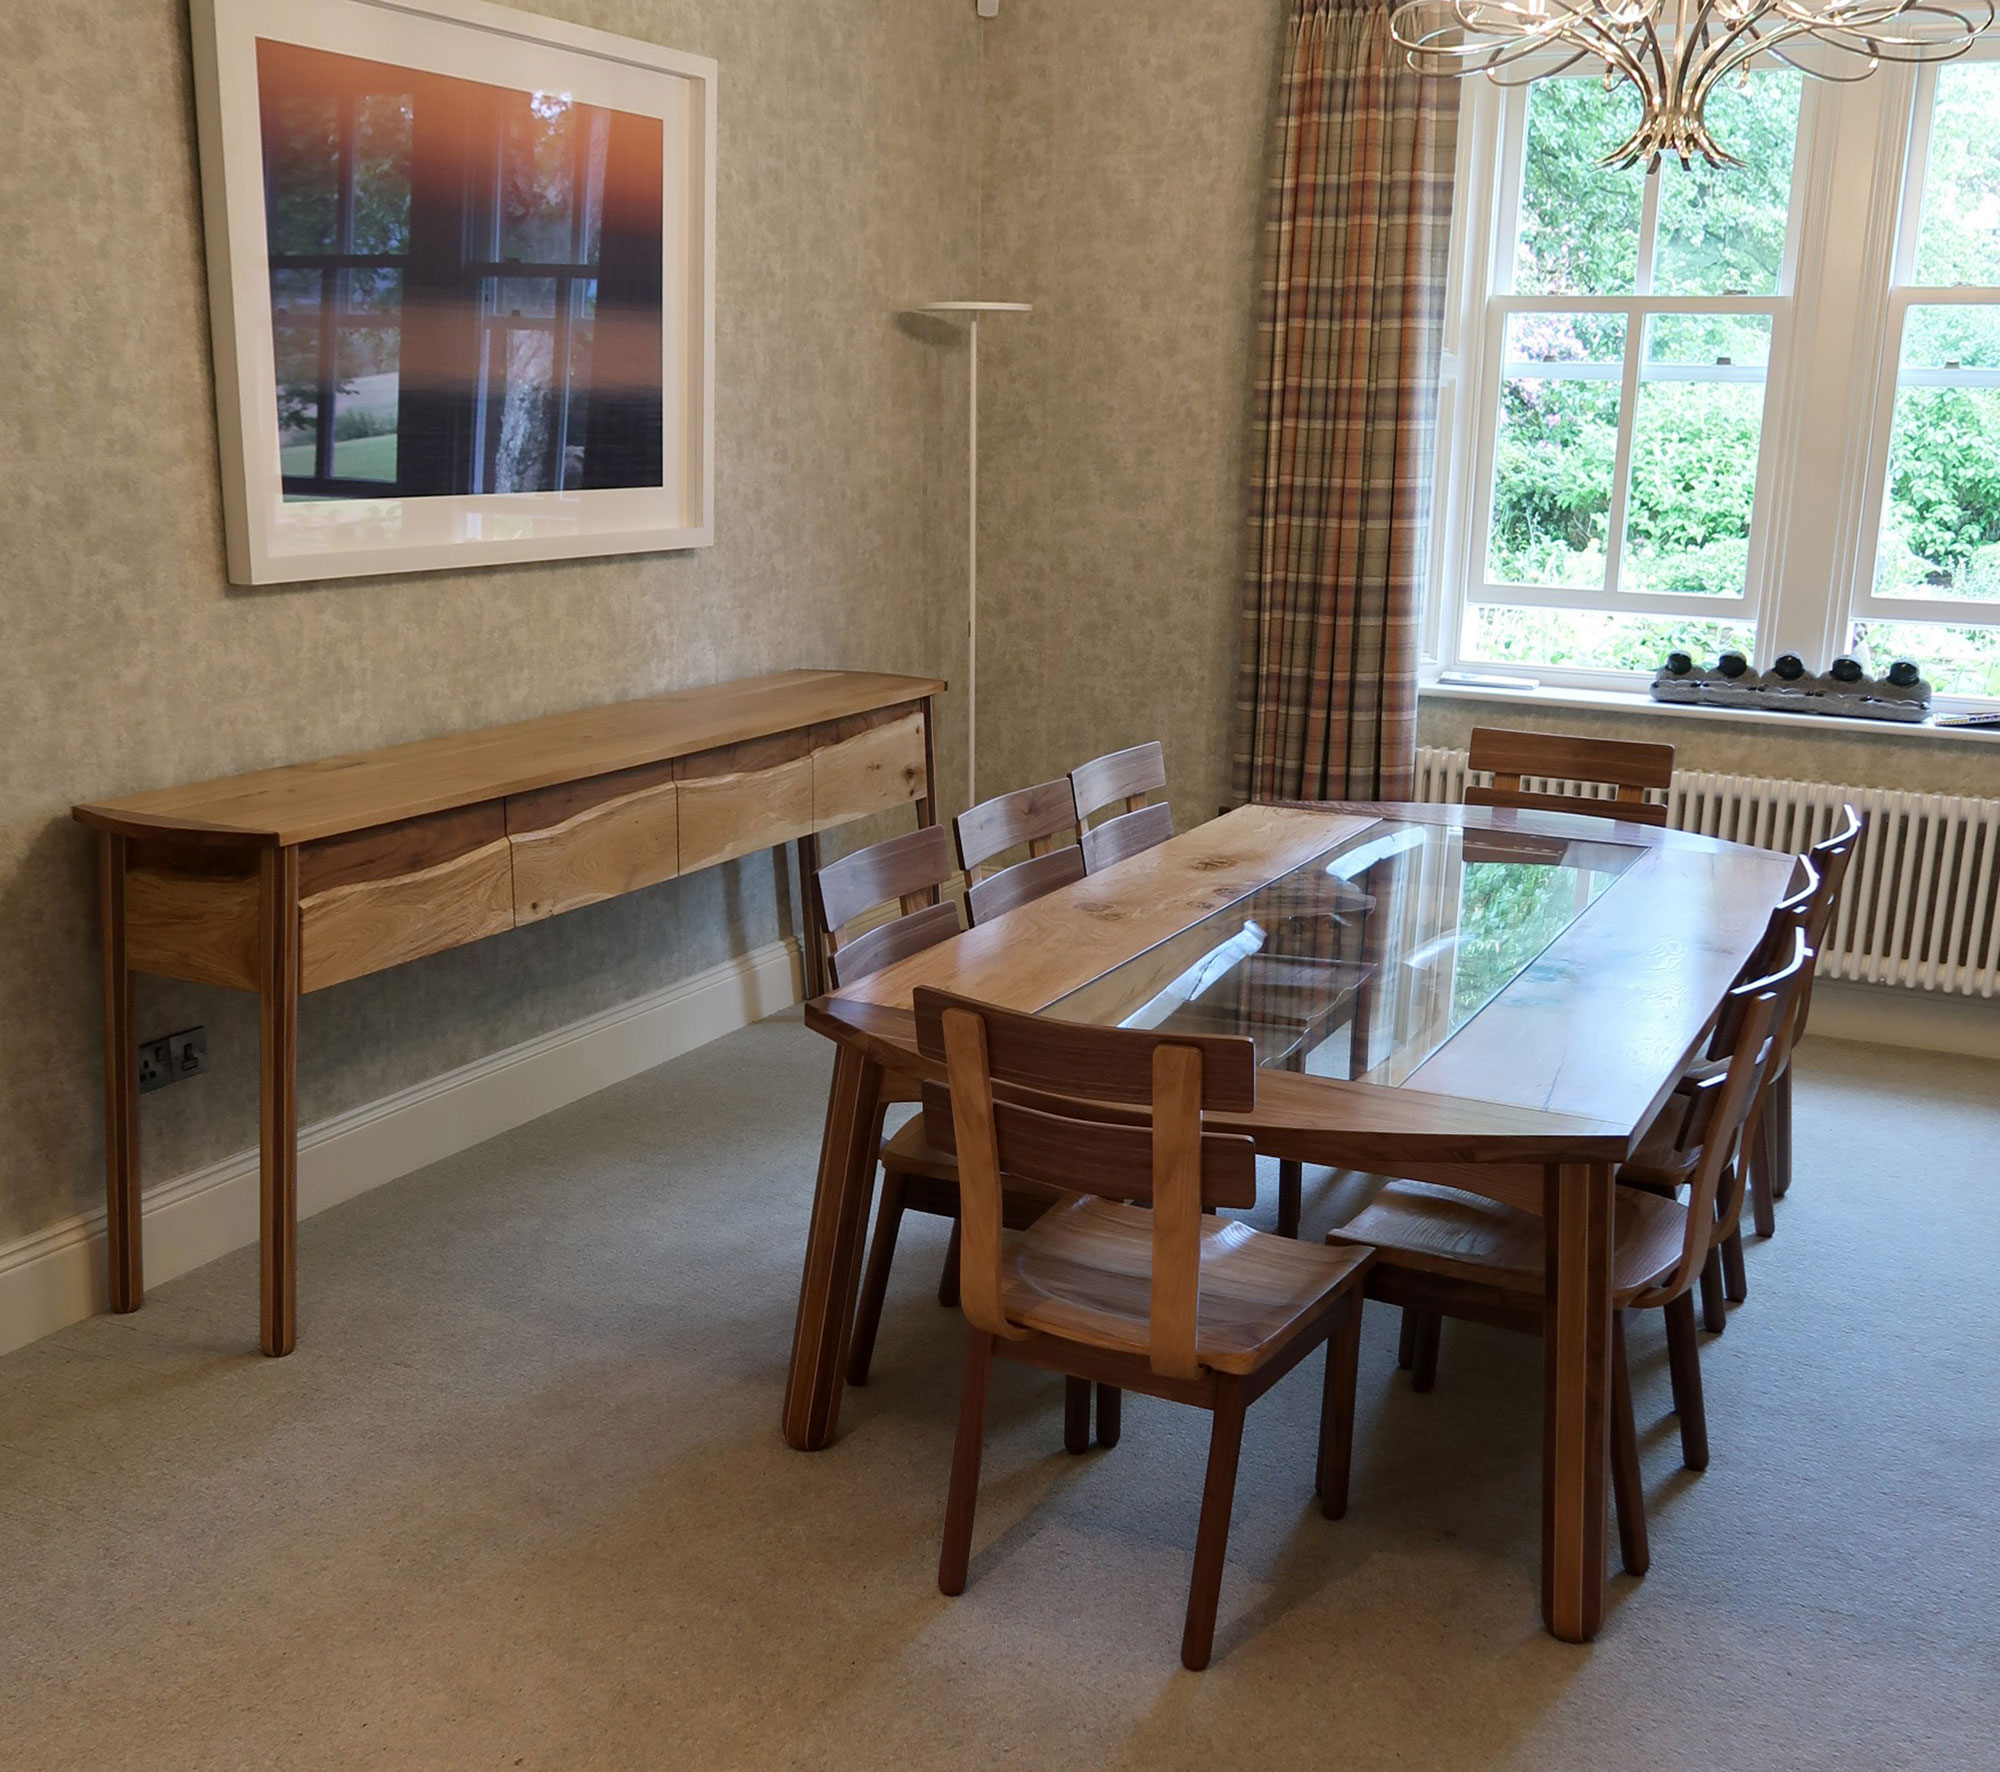 Dining Set - Live Cumbrian Oak